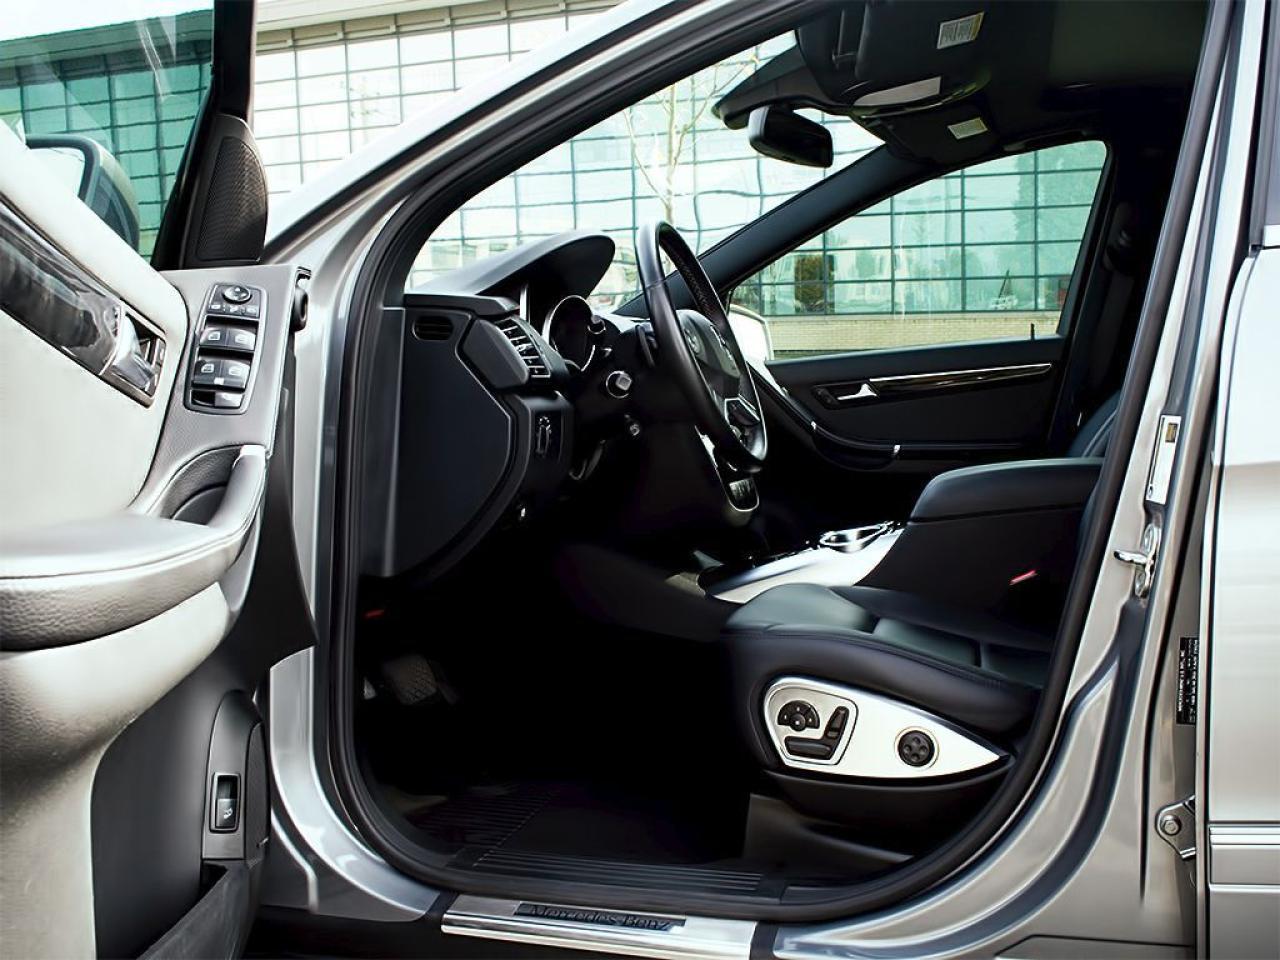 2012 Mercedes-Benz R350 AMG|NAVI|REARCAM|DUAL DVD|PANOROOF|7 SEATS